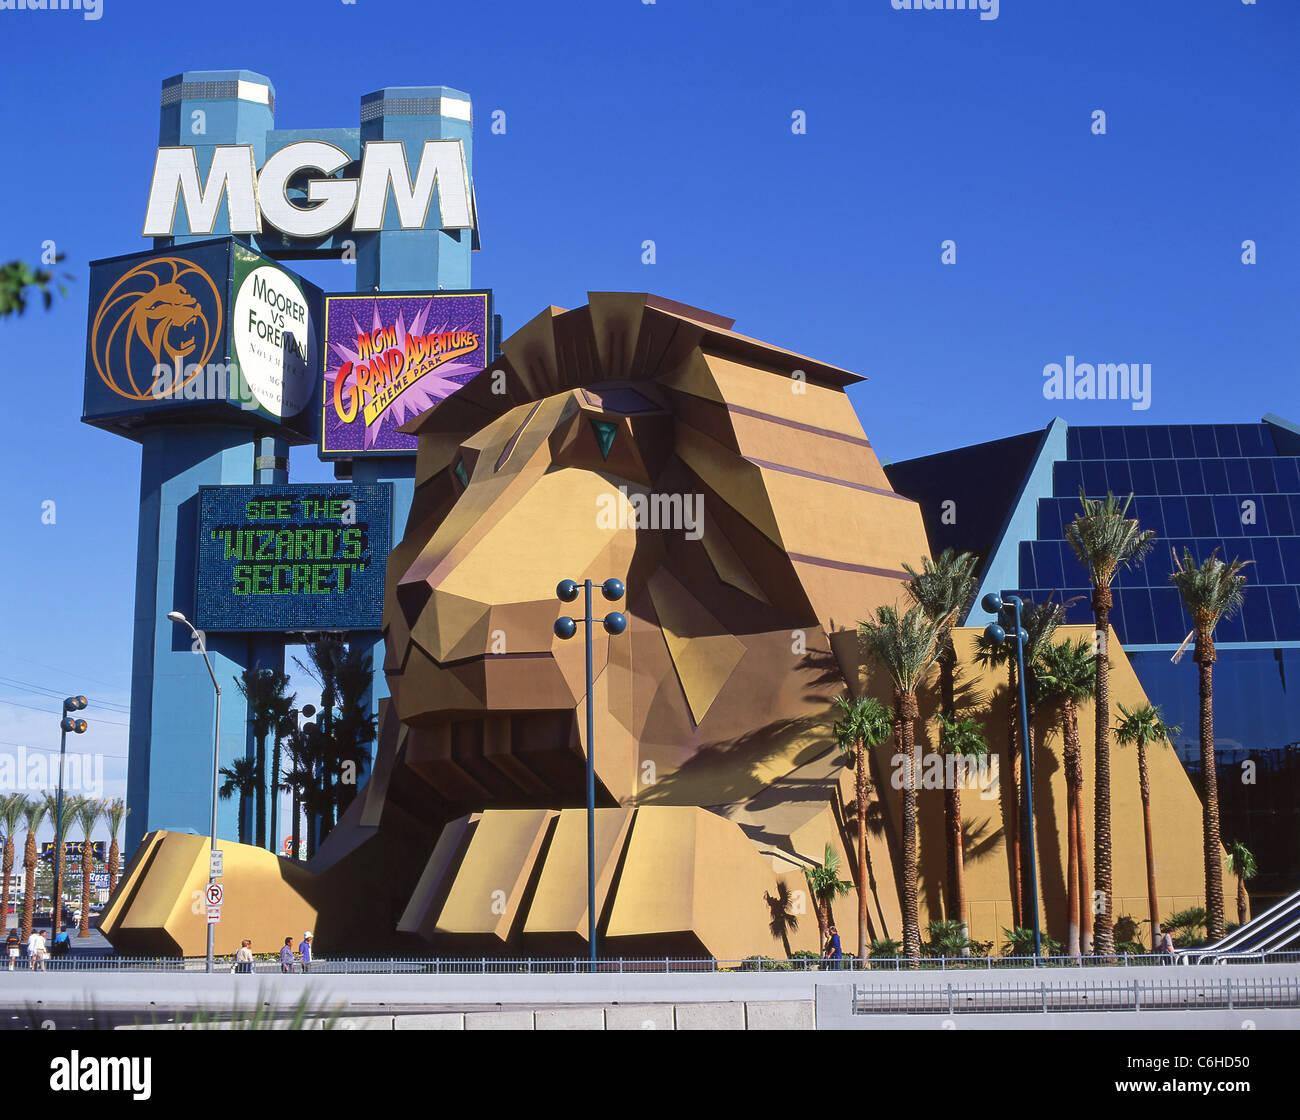 Introduction Mgm-grand-hotel-casino-lion-entree-privee-la-bande-de-vegas-las-vegas-nevada-united-states-of-america-c6hd50